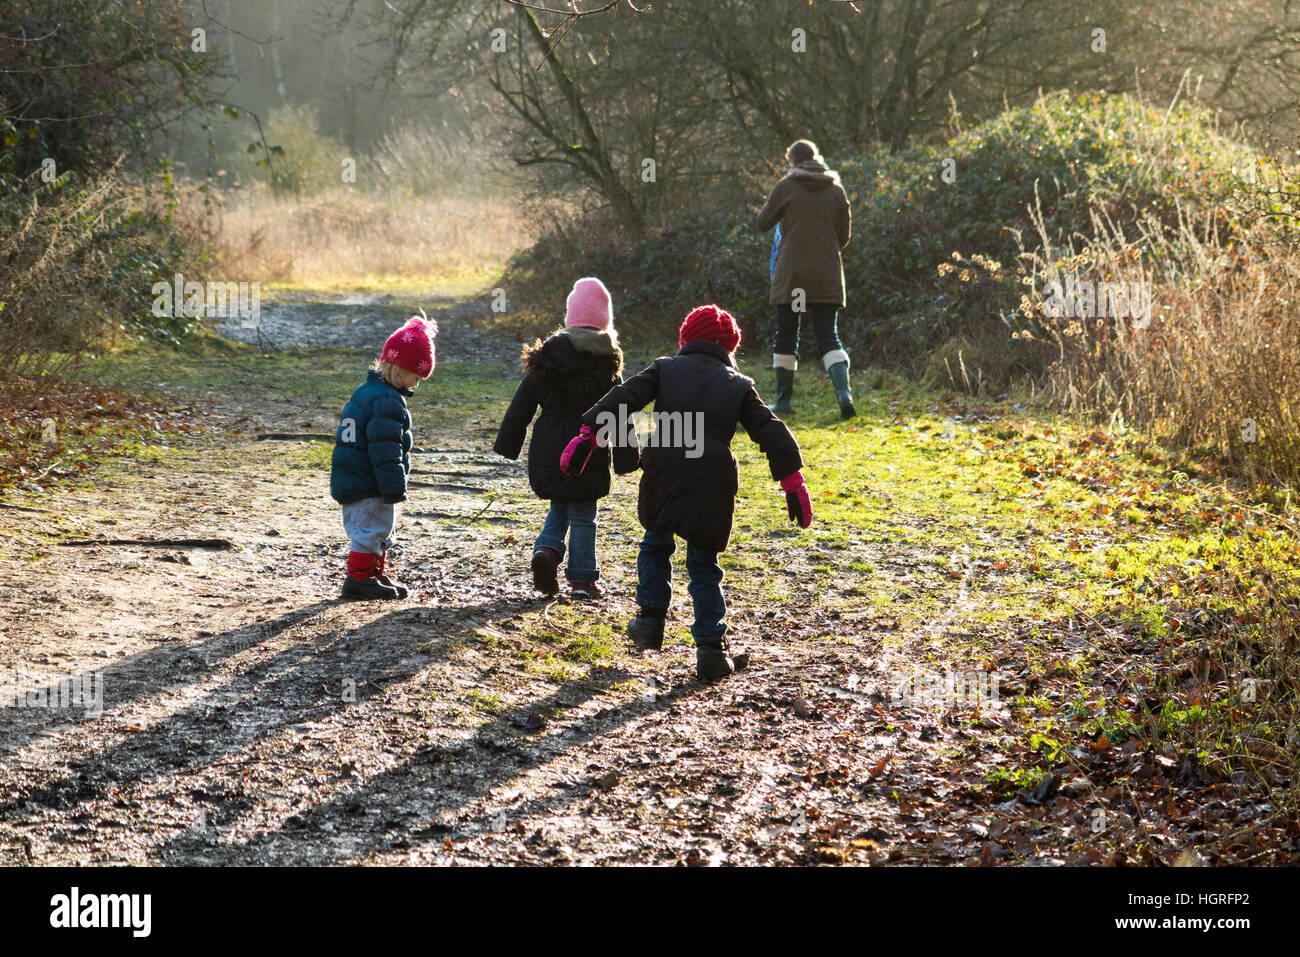 Mother & 3 children three kids daughters walking / walk along muddy path / in mud on walkway pathway foot path - Stock Image